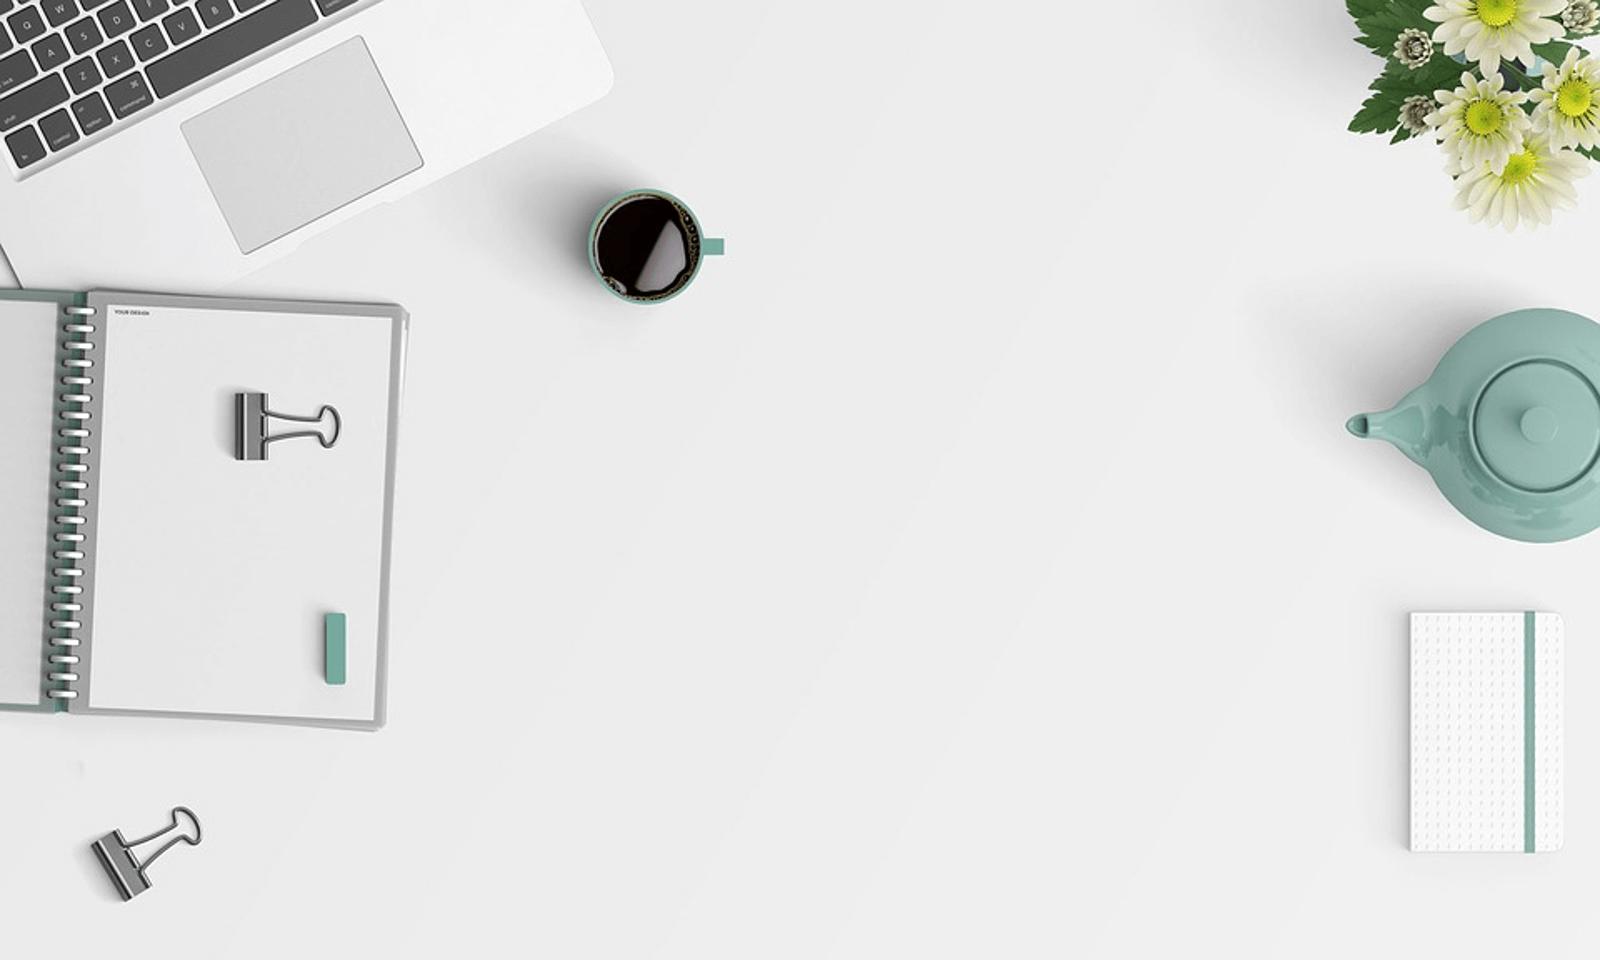 We love to blog about data analytics